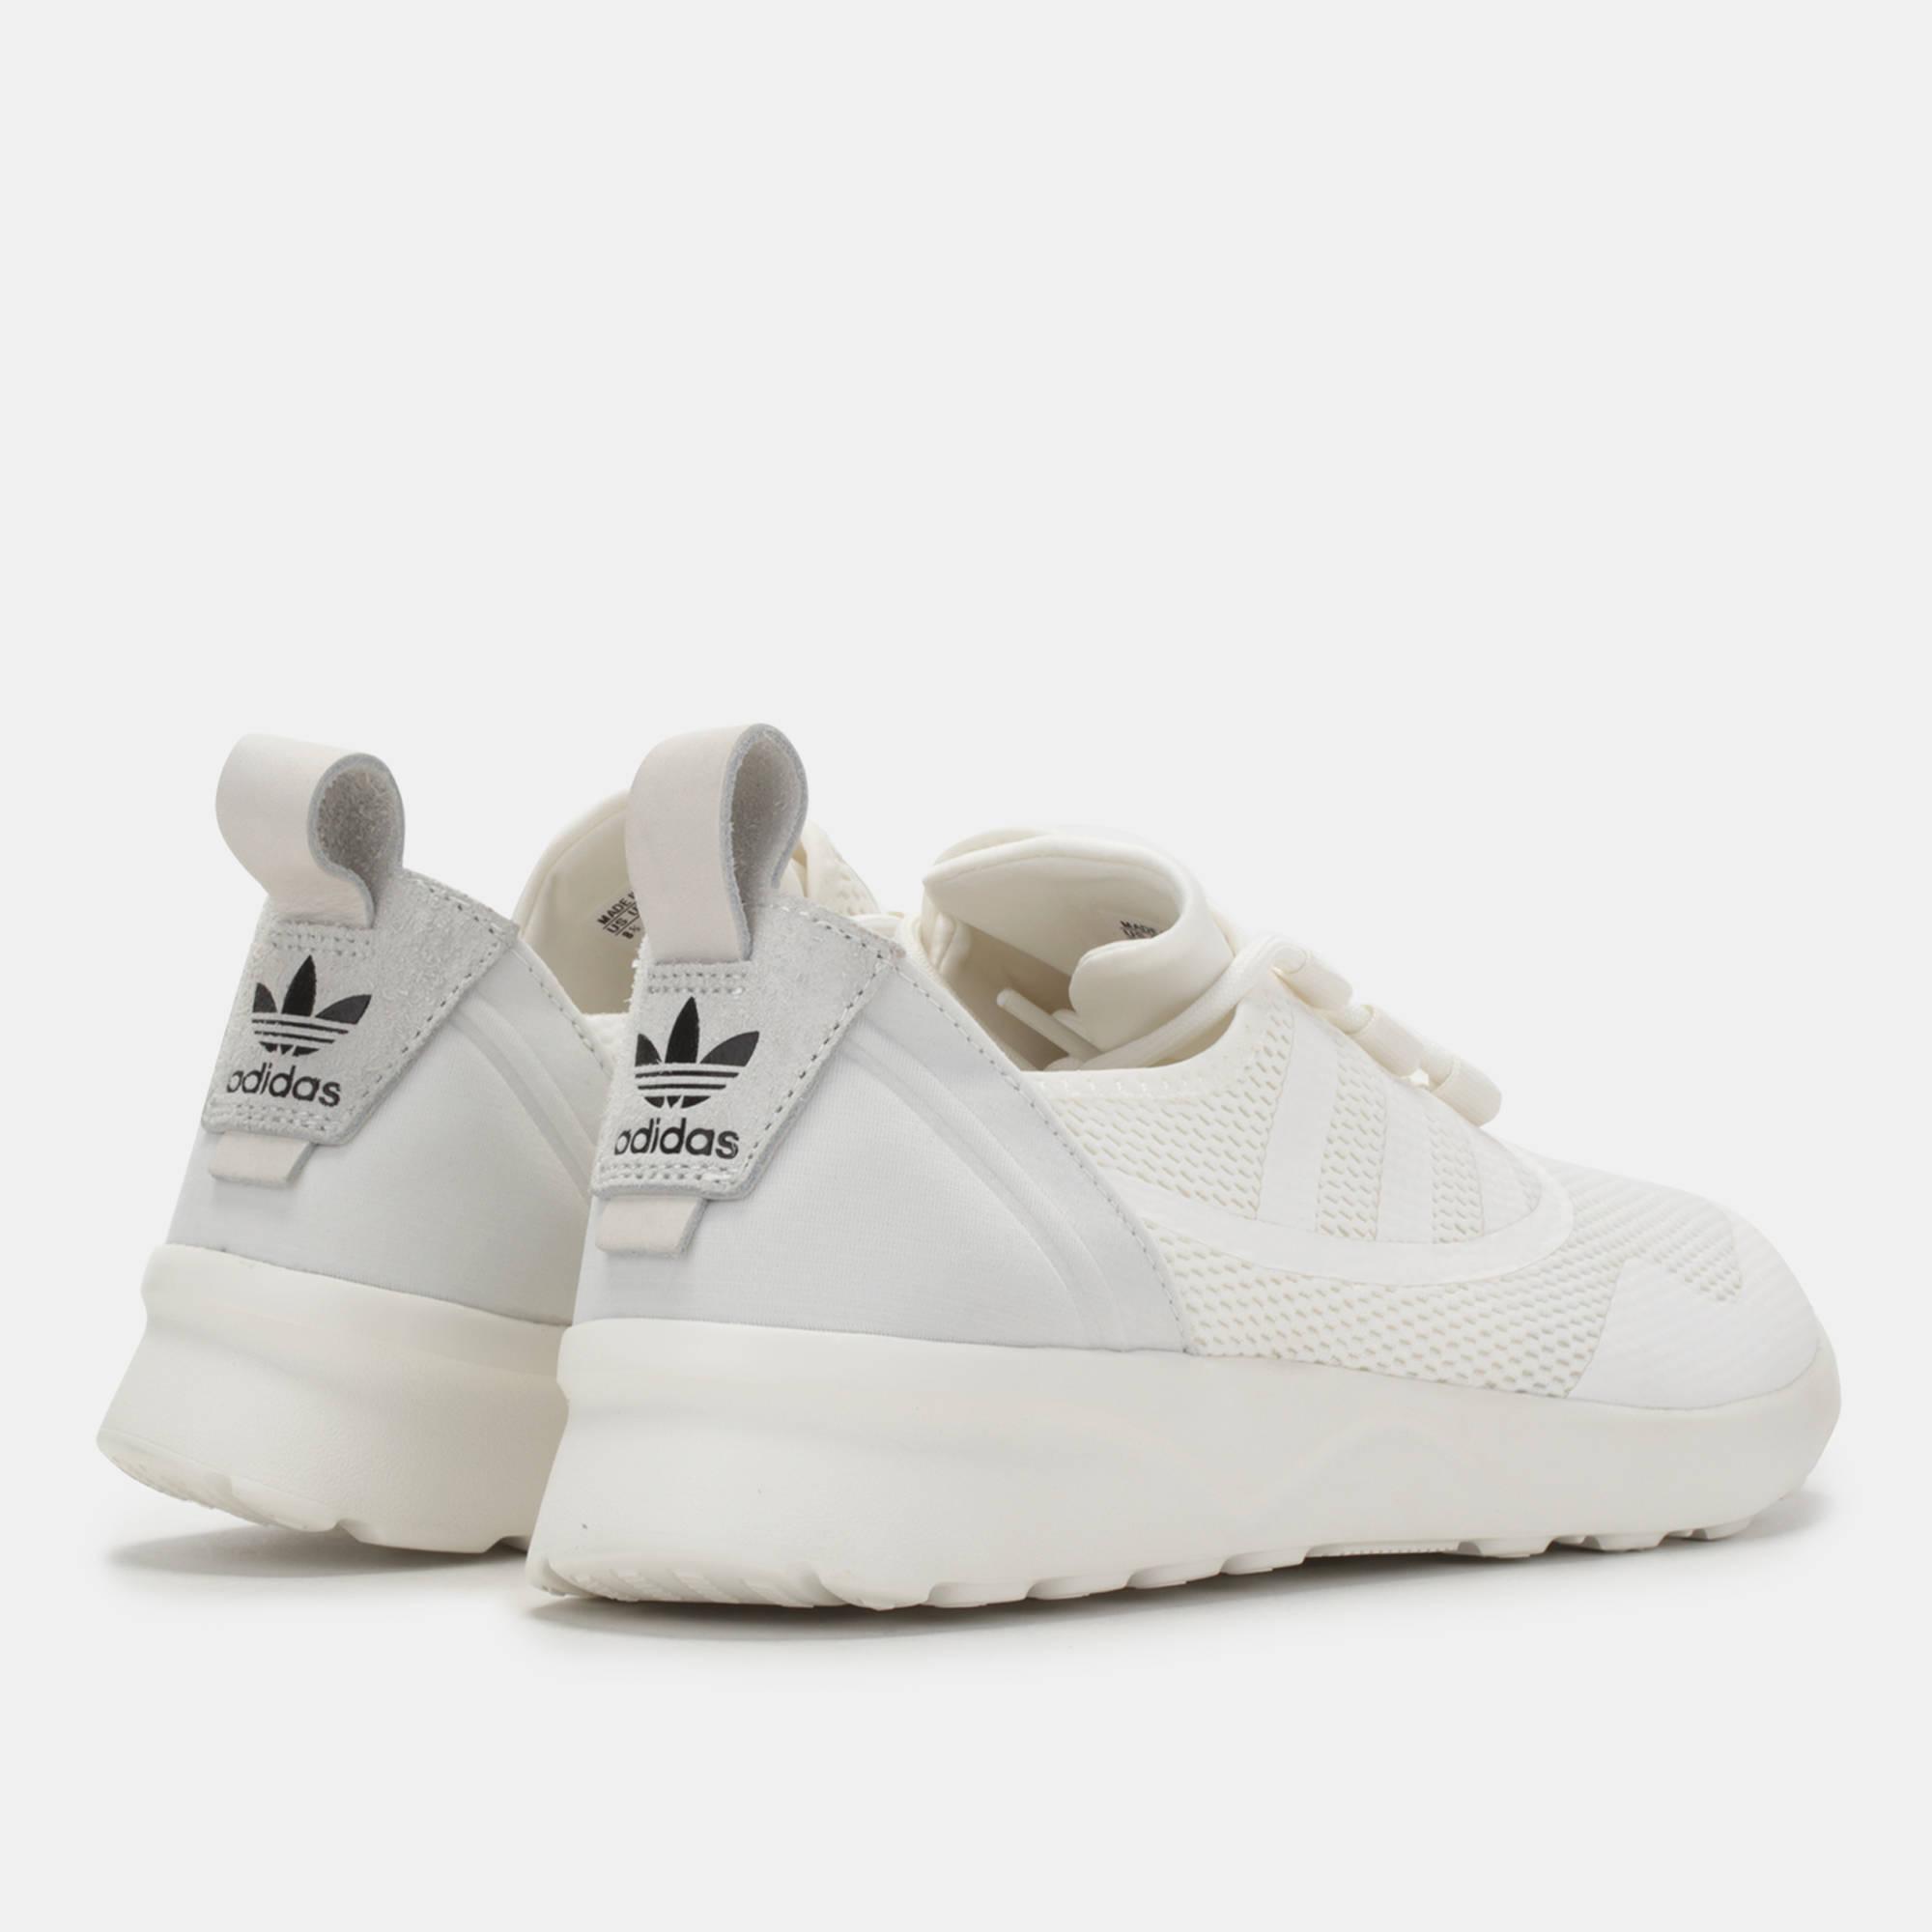 outlet store 7b1a7 dc0e4 usa adidas zx virtue 20d04 c9fcc